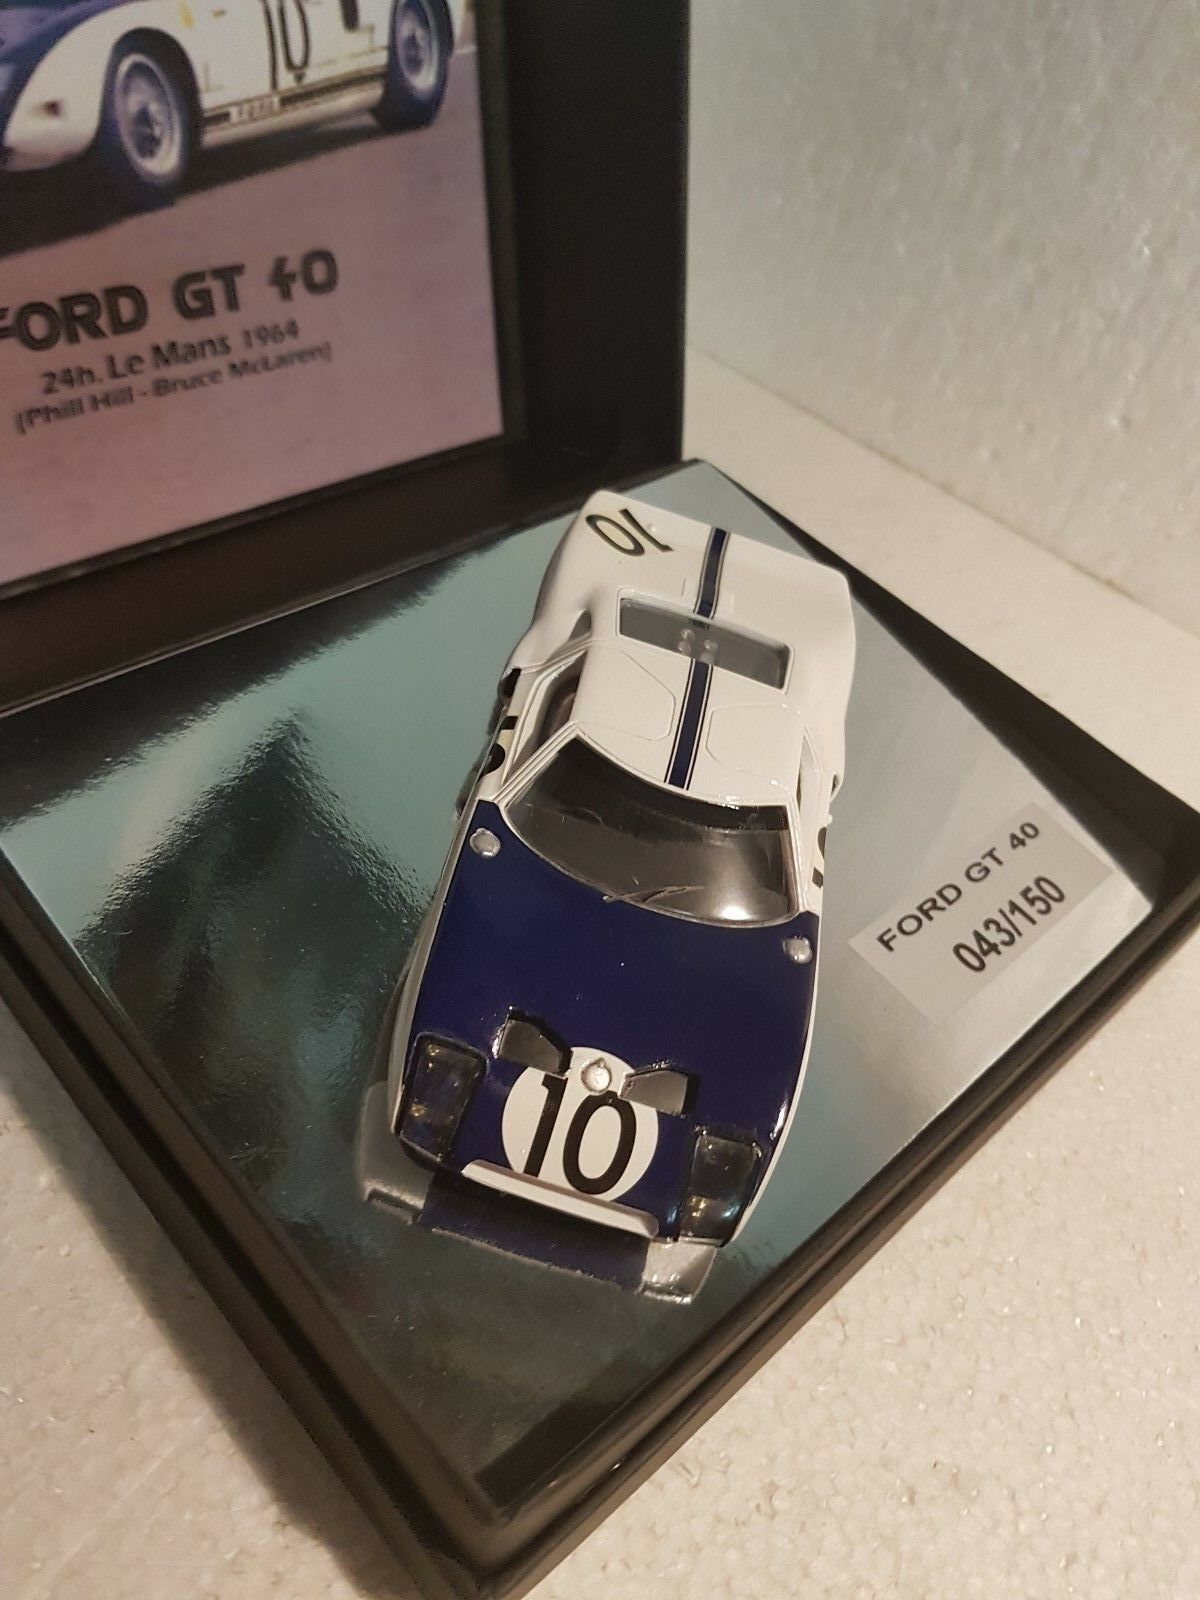 QQ HOBBY CLASSIC CLASSIC CLASSIC CL-11 Ford GT40 24h Le Mans 1964 Phill Hill - BRUCE MC laren c55299